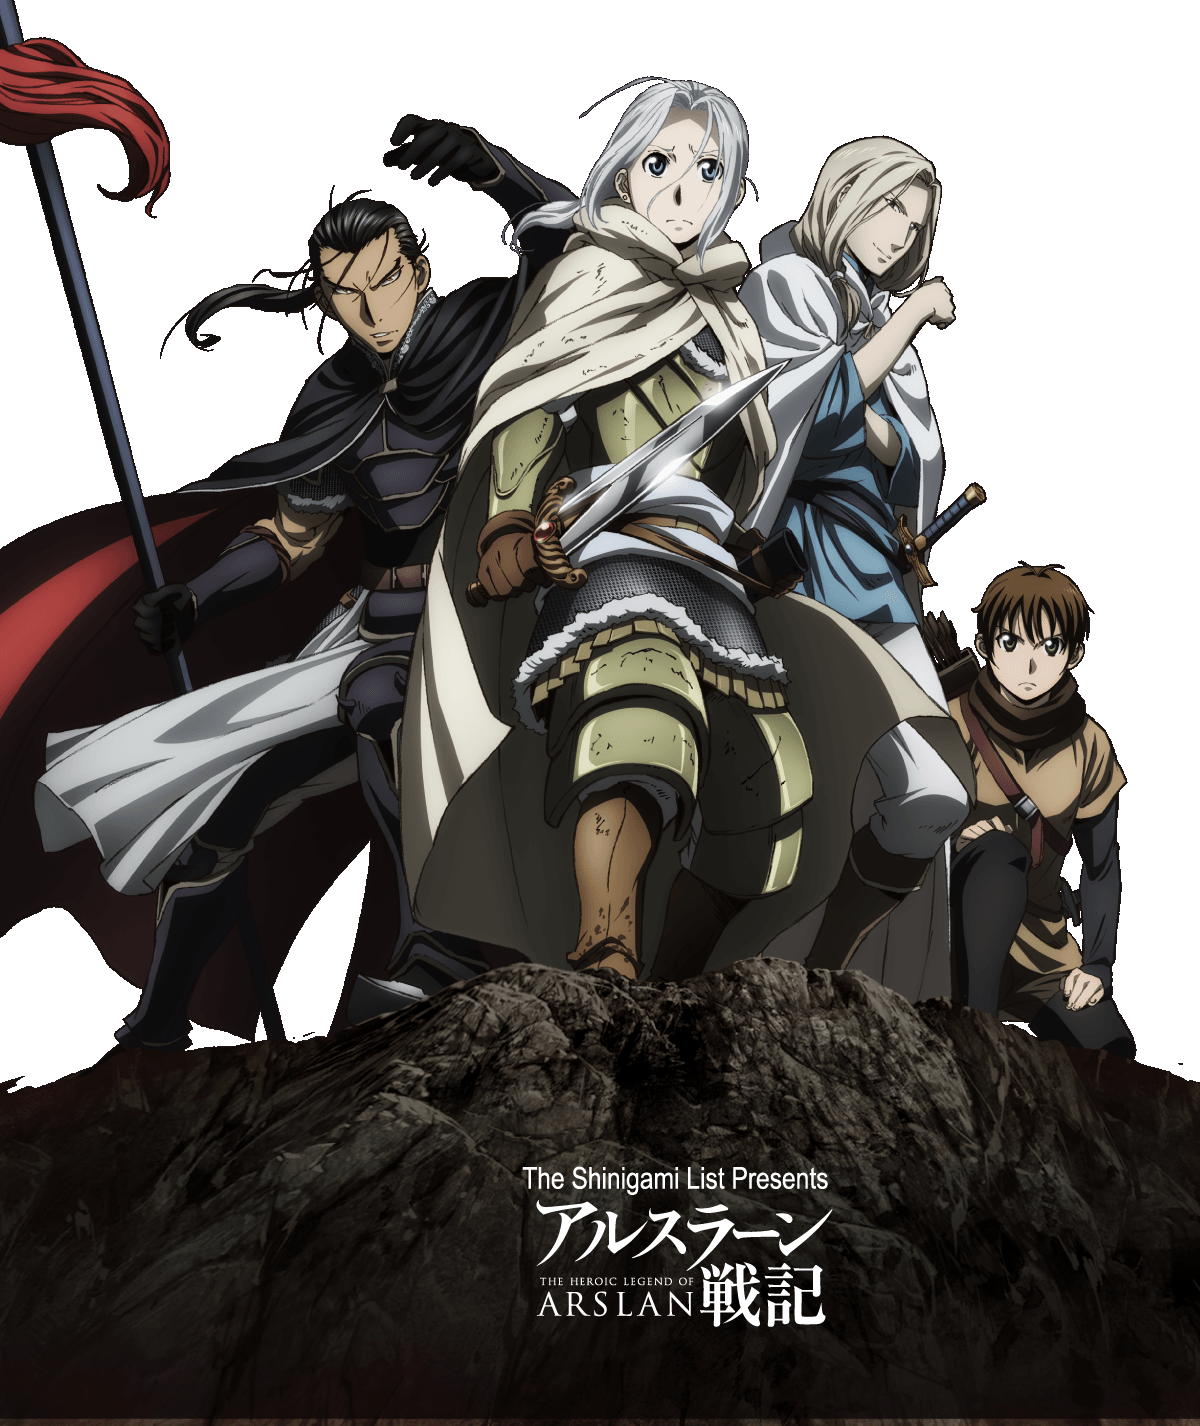 https://shinigamilist.files.wordpress.com/2015/03/arslan-senki-anime-poster.png